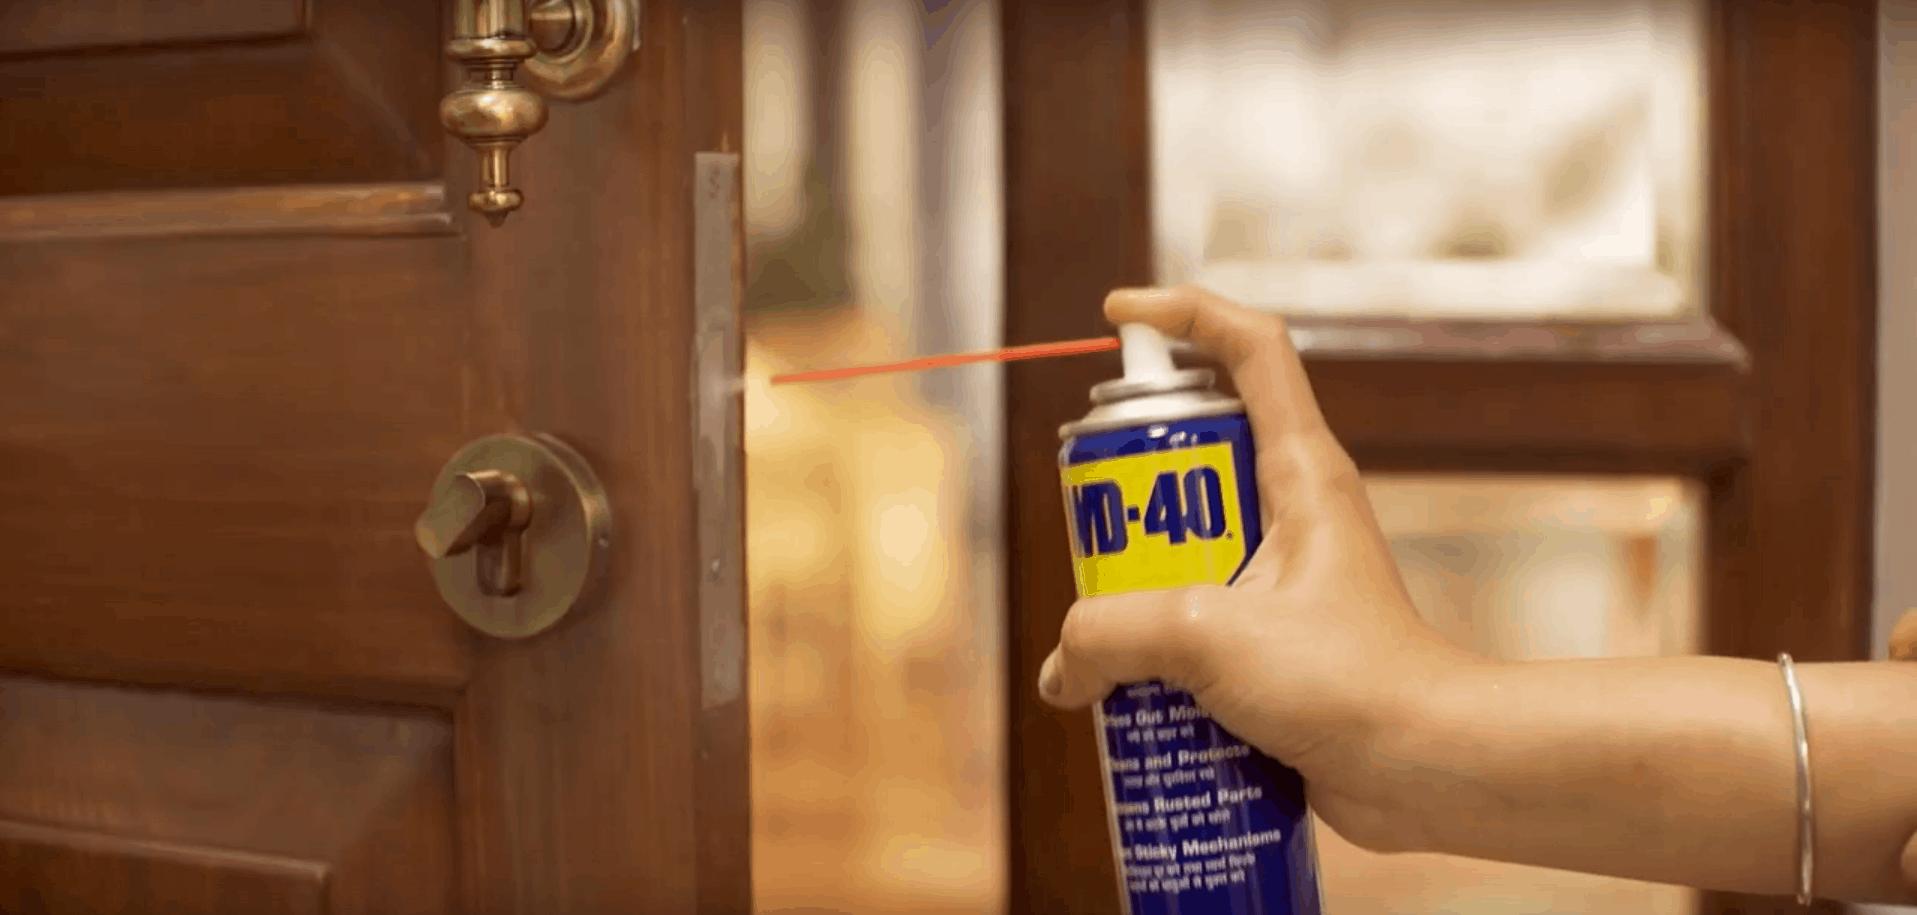 Jammed Slide Locks & How To Fix Them